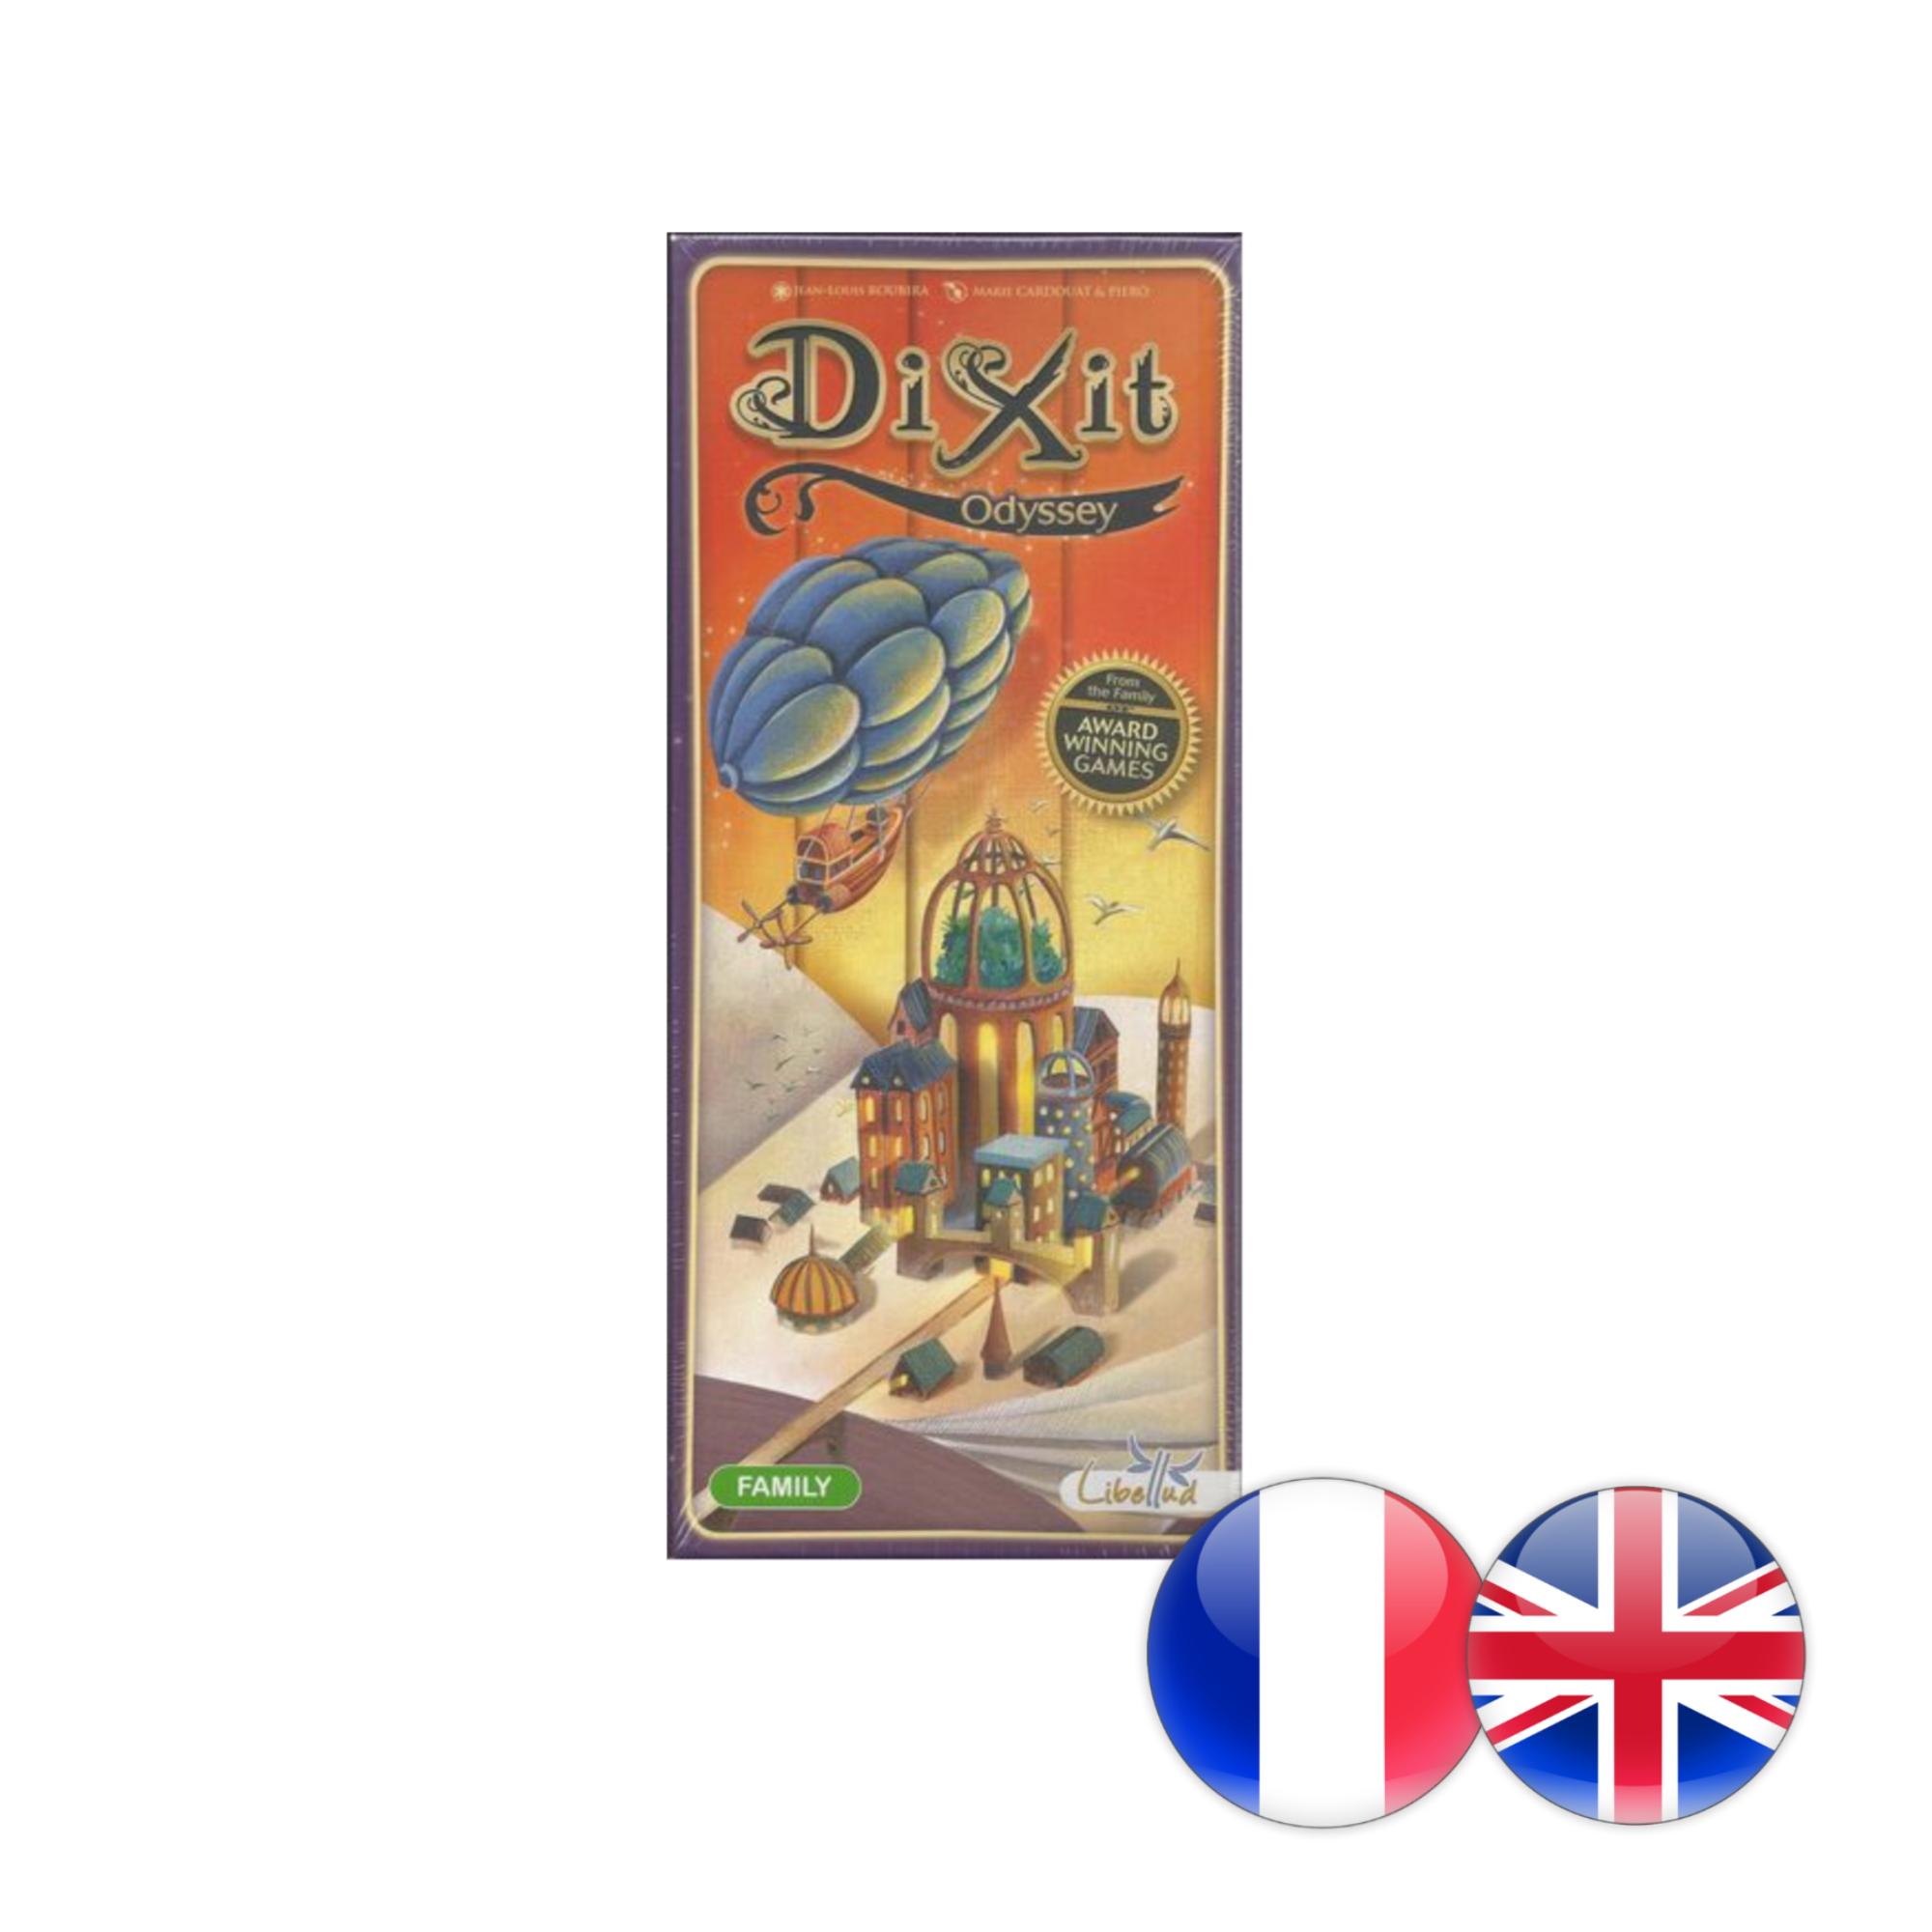 Filosofia Dixit: Odyssey